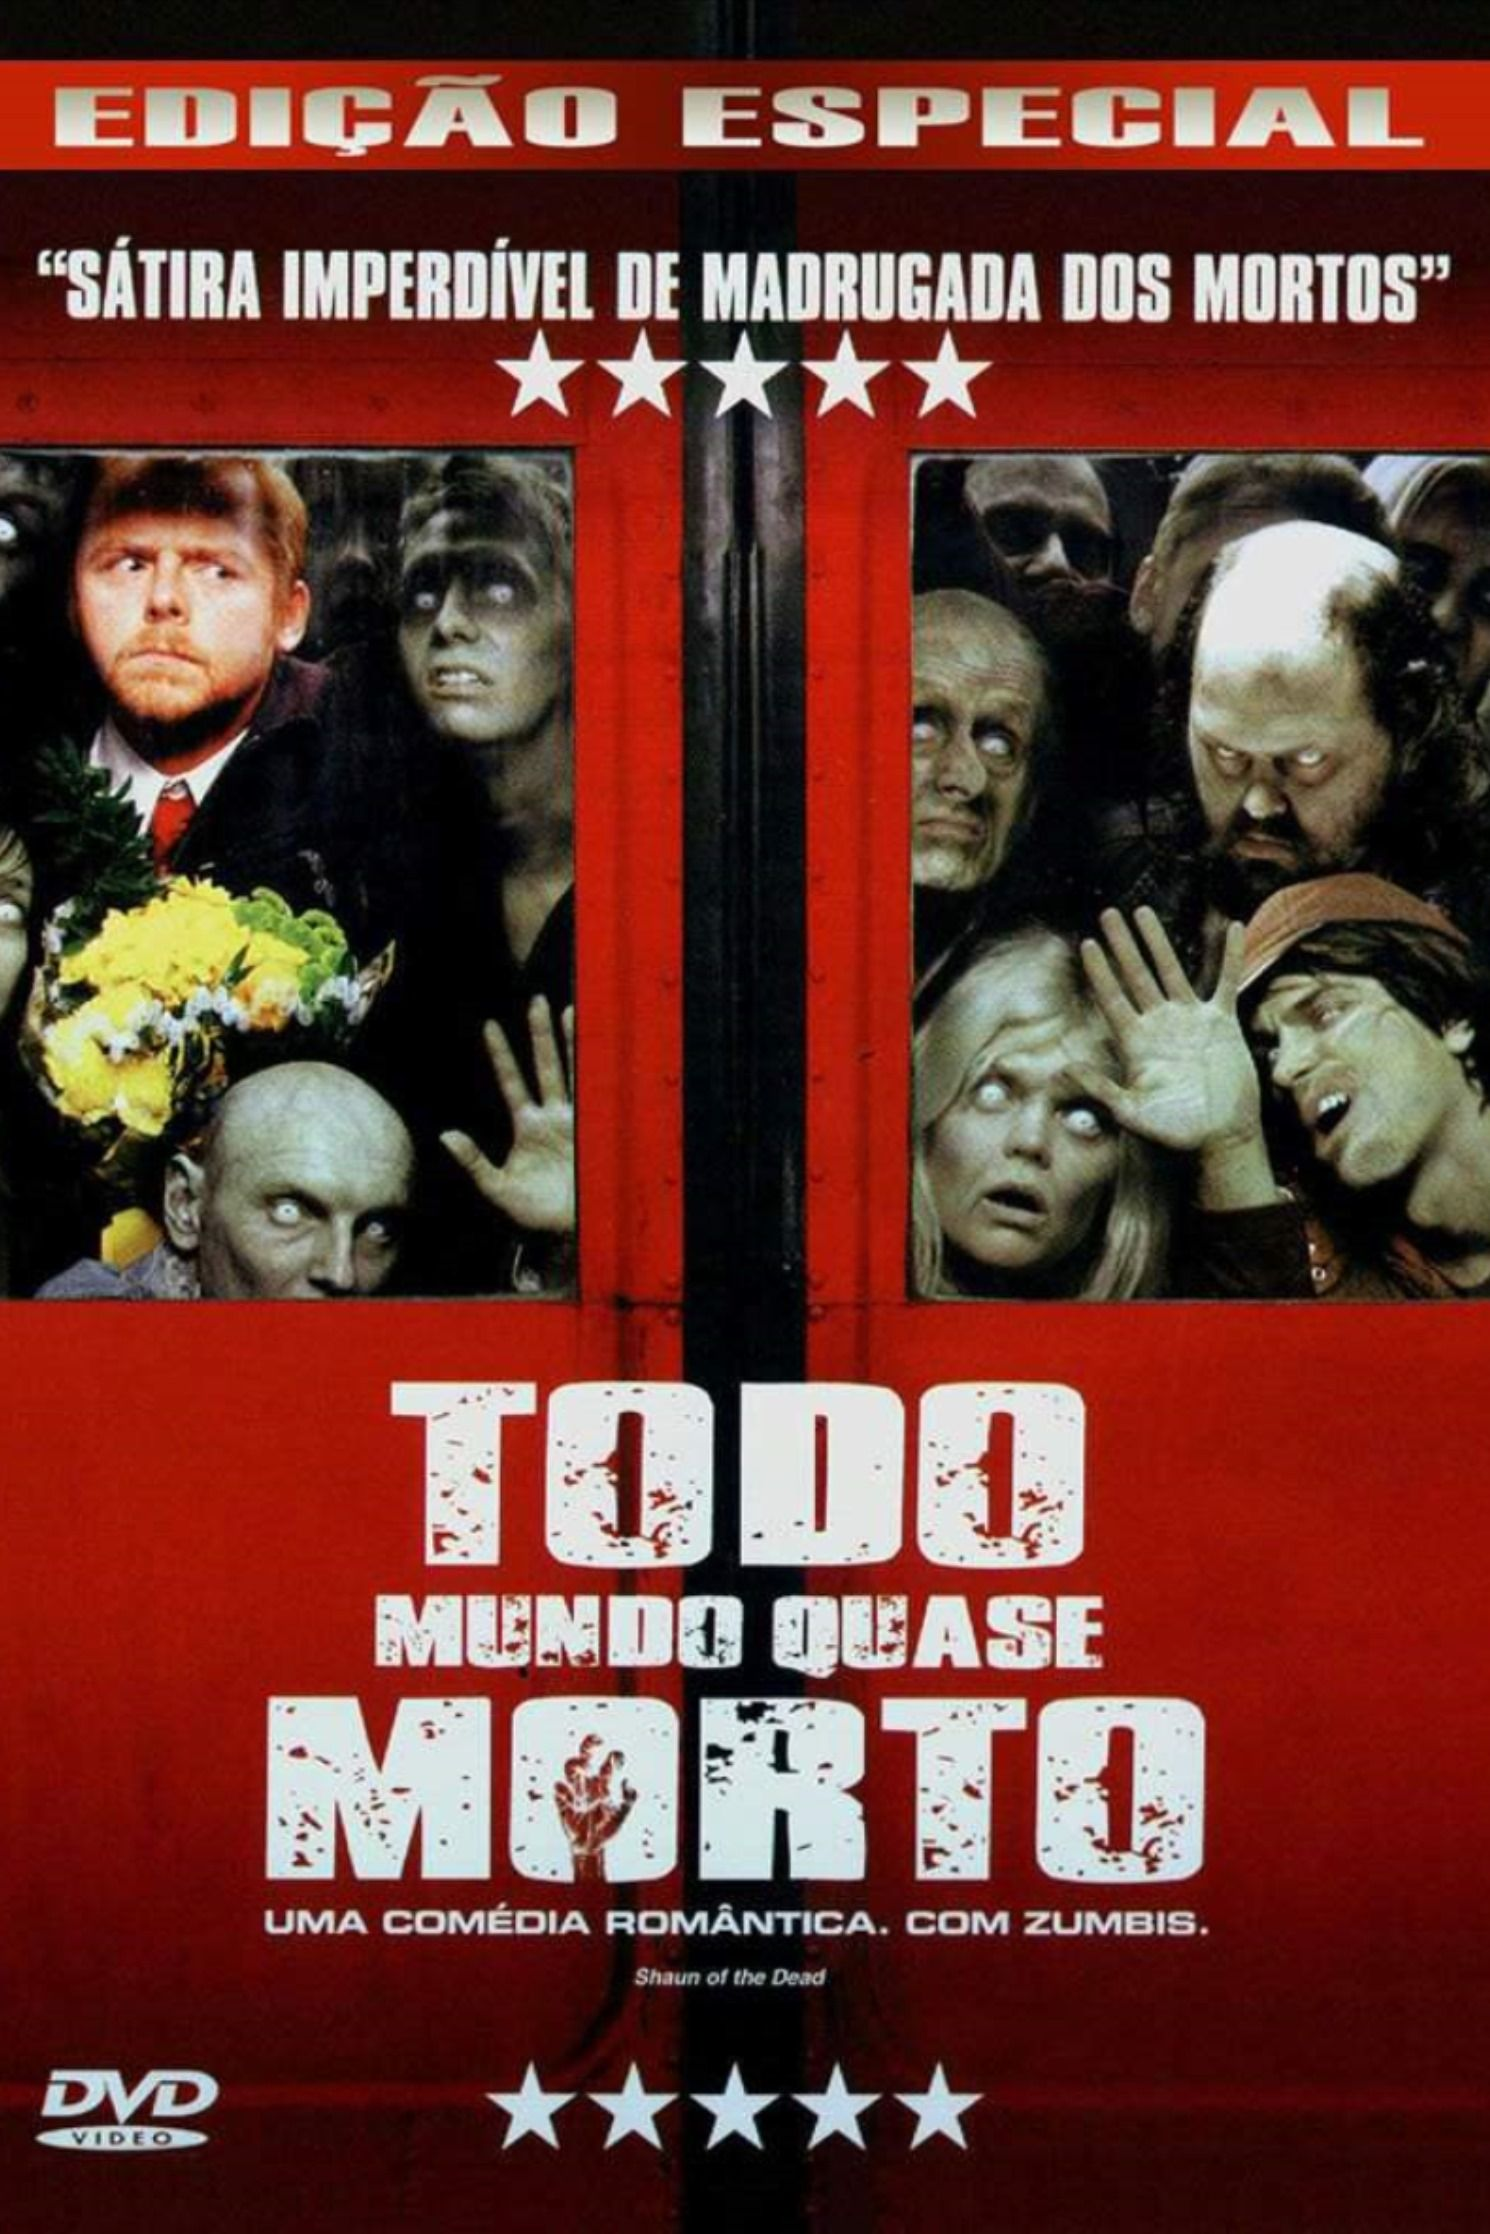 Todo Mundo Quase Morto 2004 Todo Mundo Quase Morto Filmes